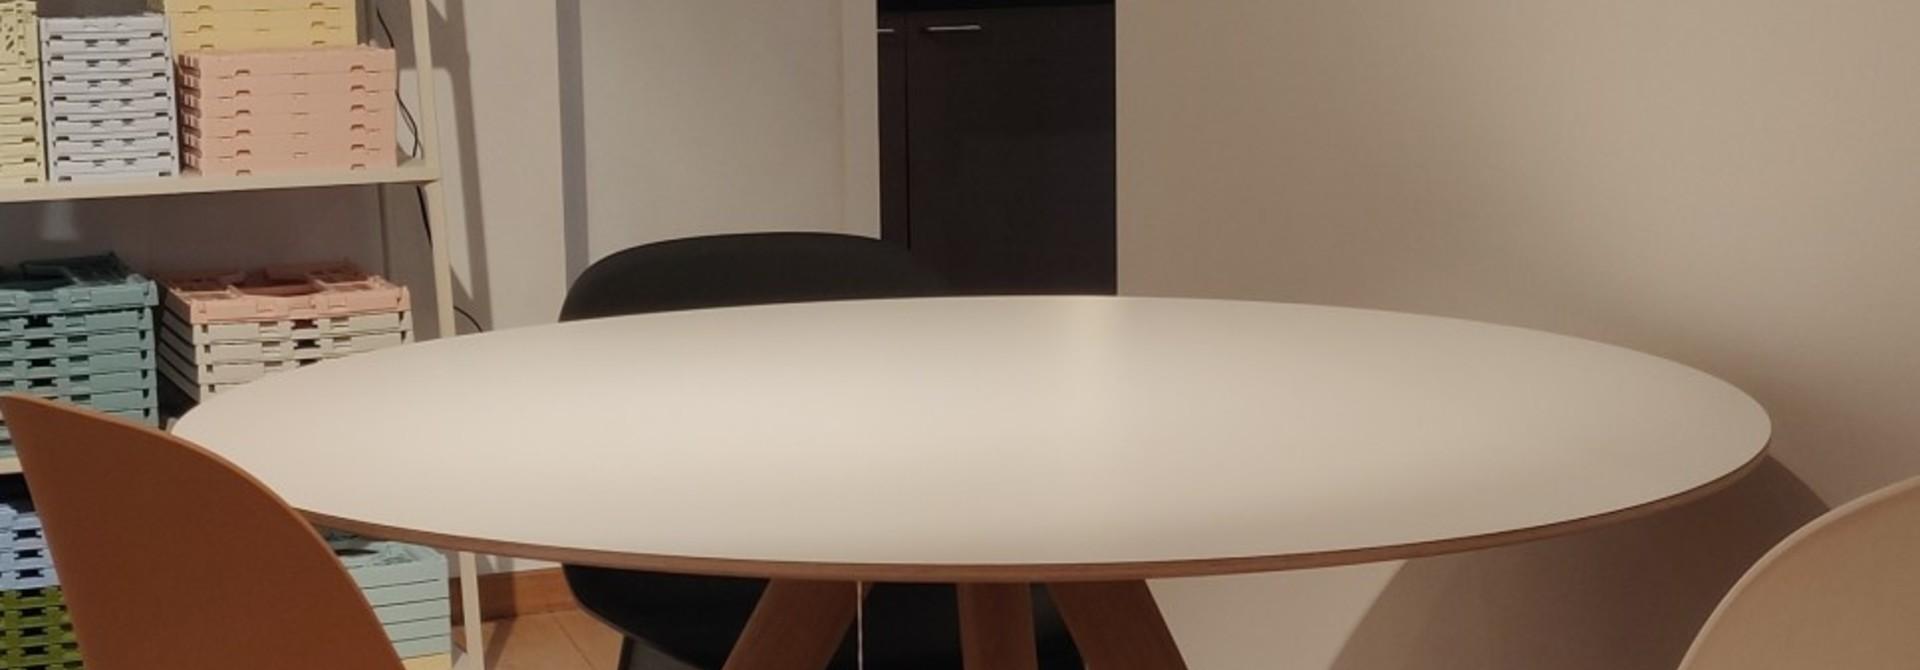 Toonzaalmodel CPH 20 - Matt lacquered solid oak White laminate dia120cm